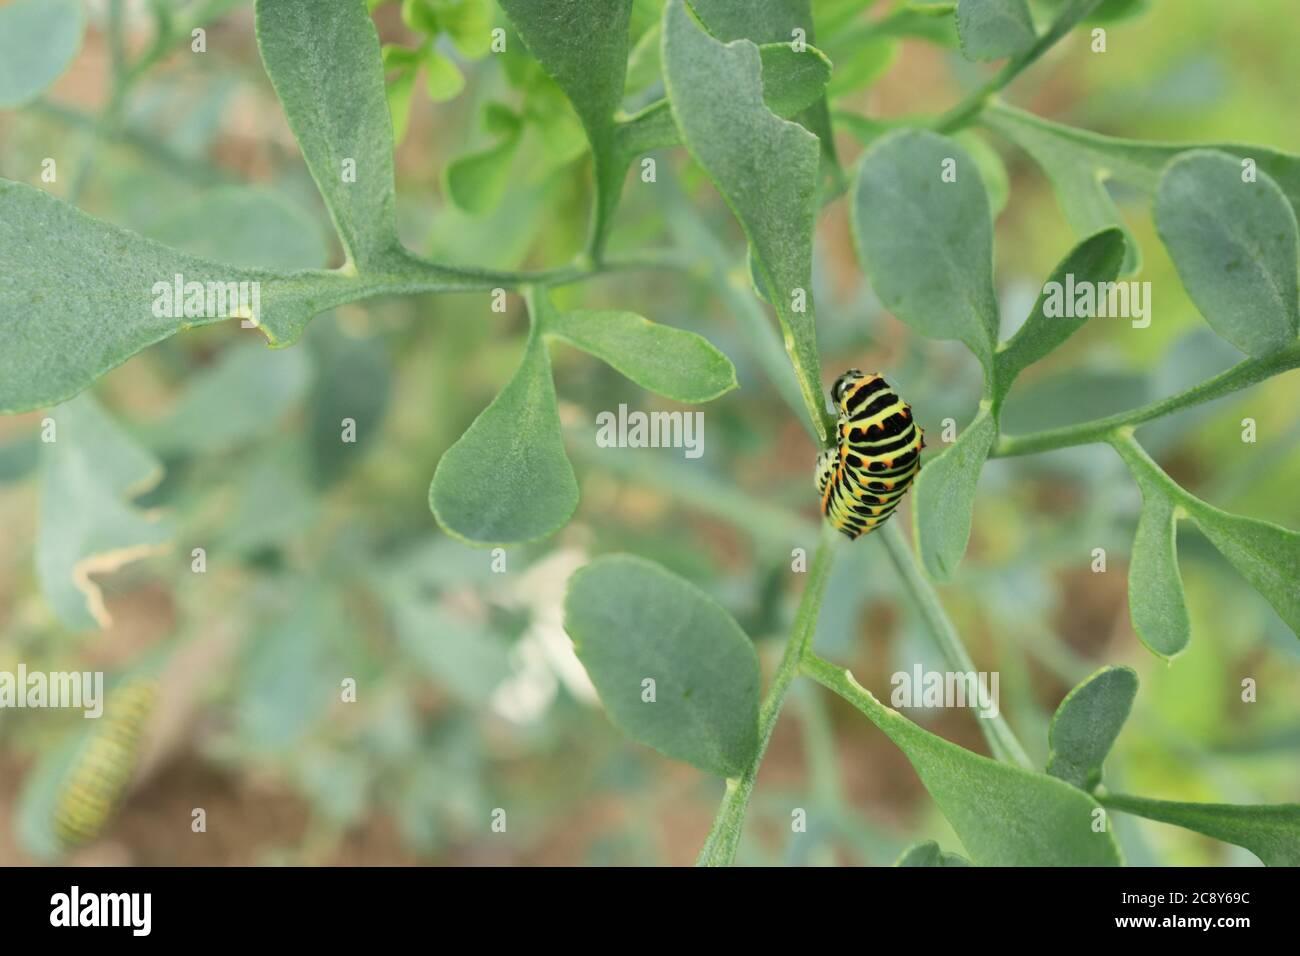 Caterpillar de swallowtail amarillo común / Viejo Mundo butterfly (Papilio machaon Papilio canadensis) en la planta de alimentación Foto de stock